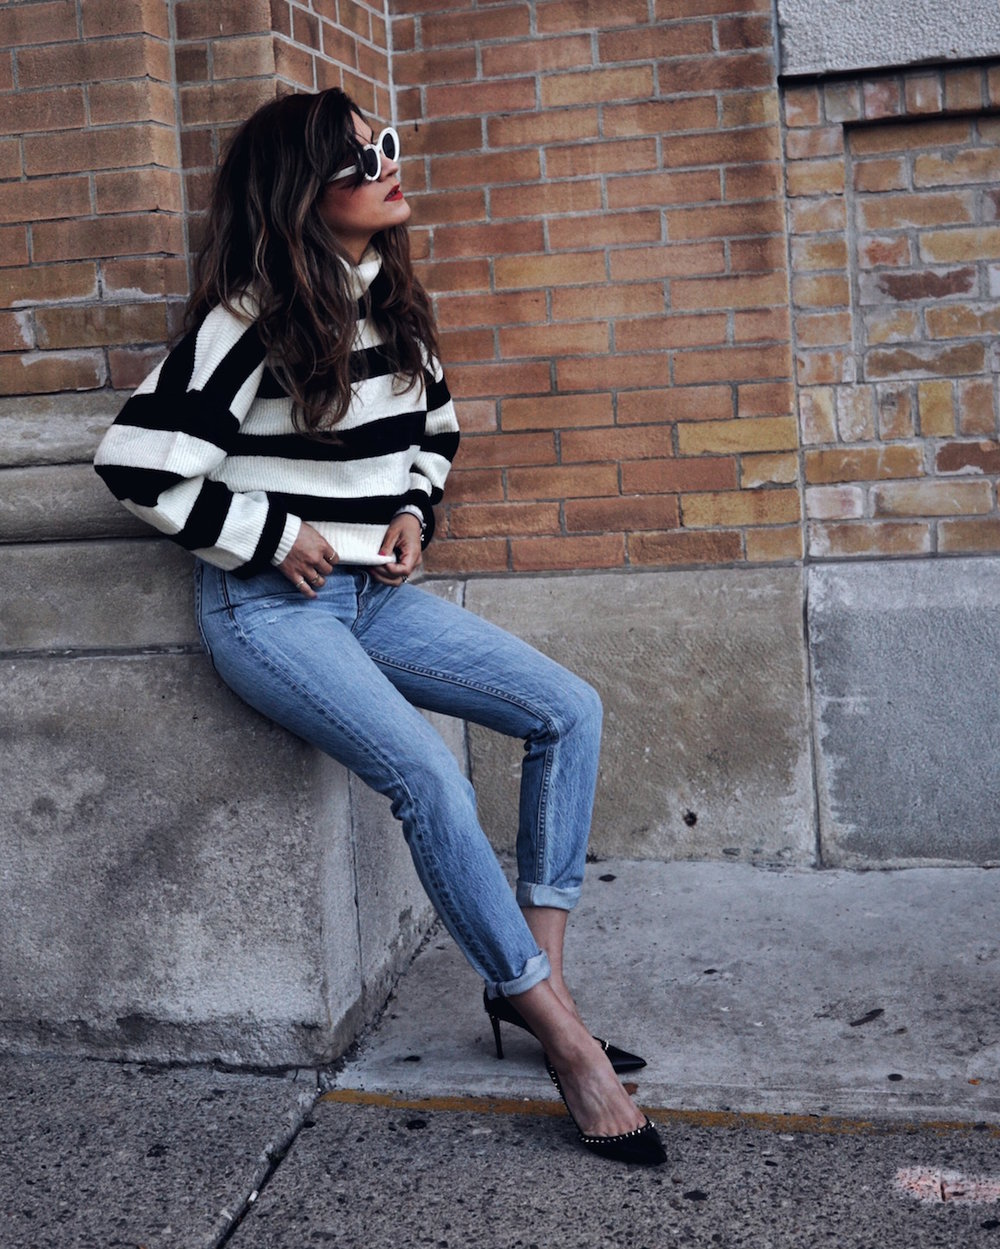 follow me on IG @_nathaliemartin - REVOLVE striped sweater, GRLFRND Karoline jeans, Christian Louboutin Anjalina shoes - woahstyle.com 2.JPG